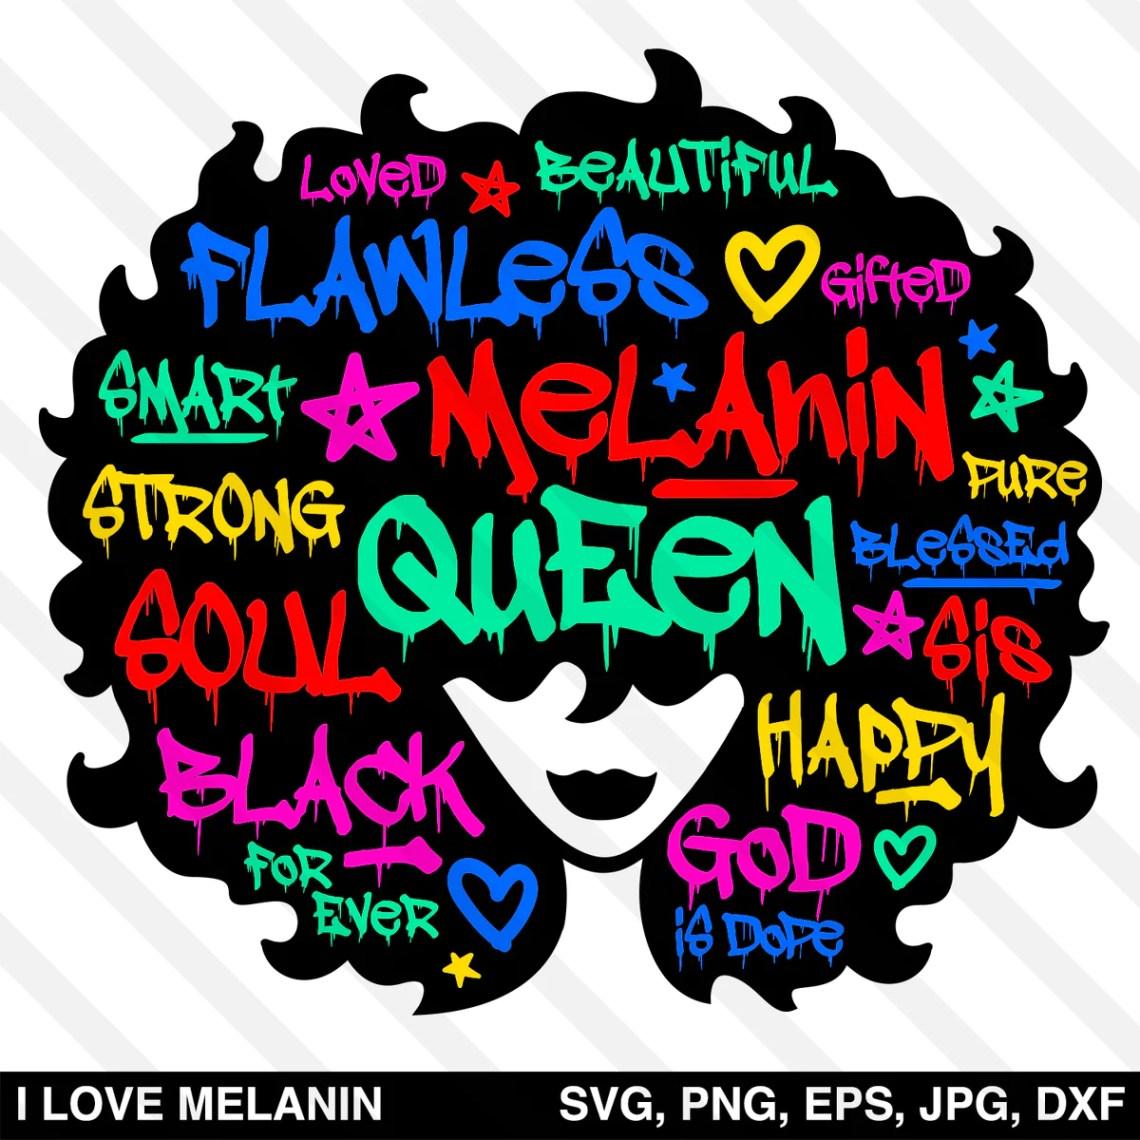 Download Graffiti Black Queen Afro Woman SVG - I Love Melanin